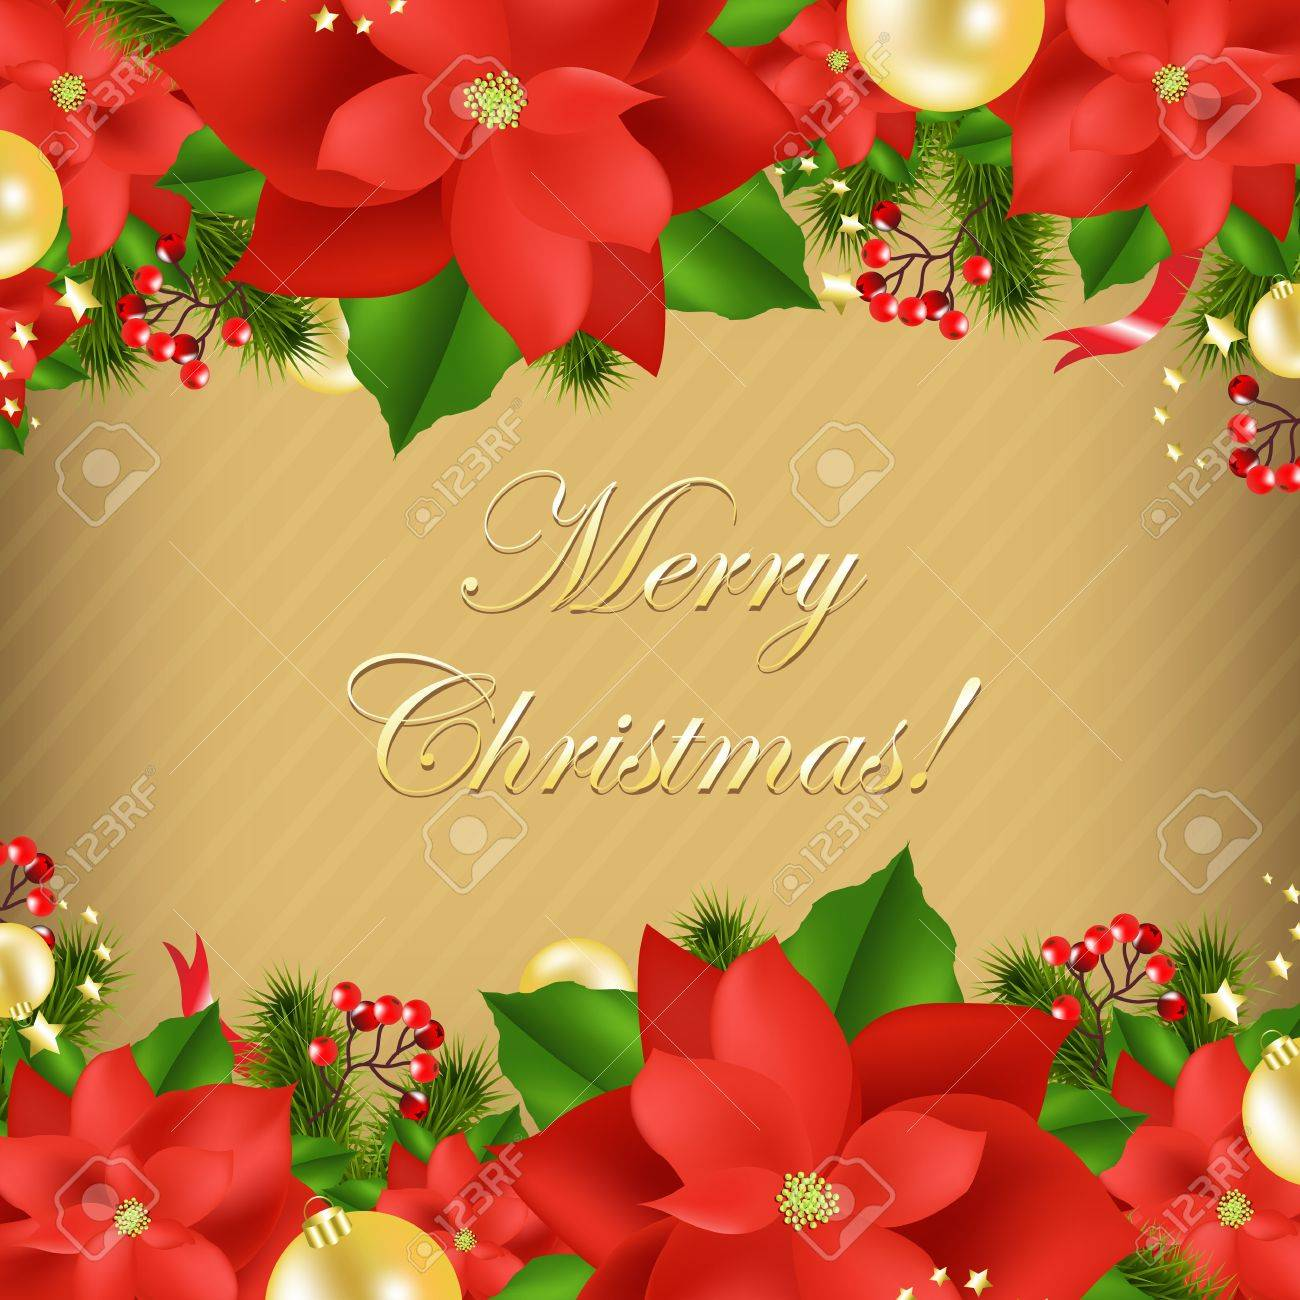 Xmas Card With Poinsettia, Vector Illustration Stock Vector - 11656648